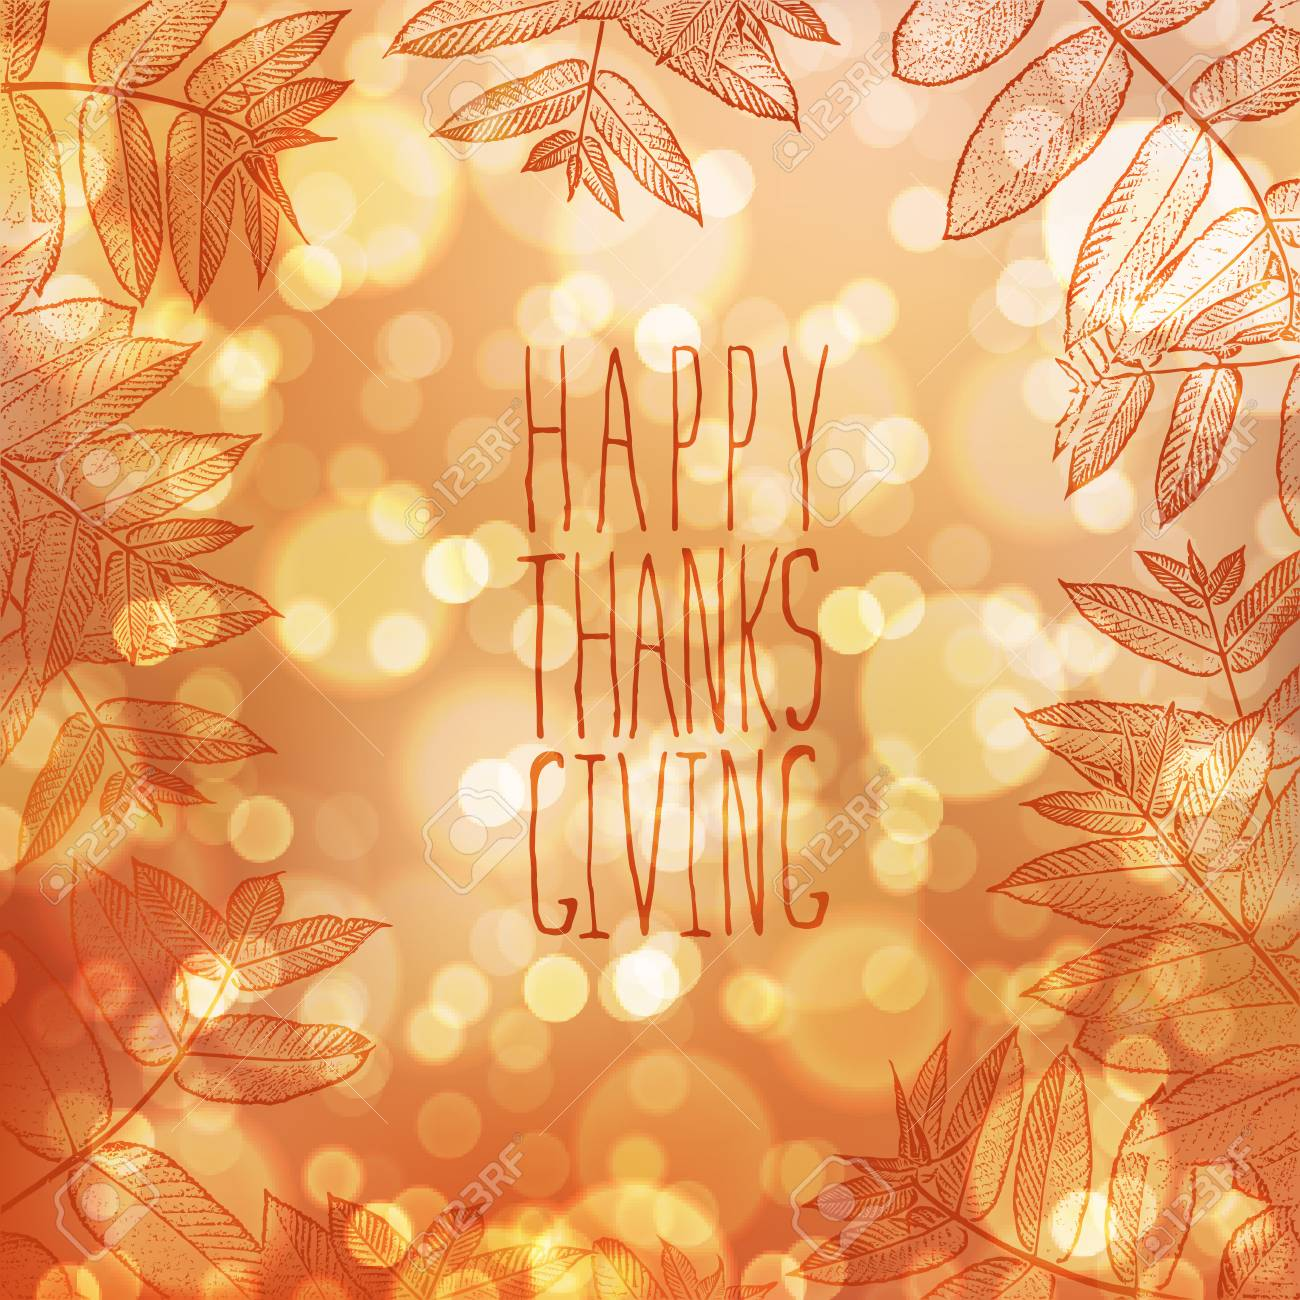 happy thanksgiving card design template blur autumn background